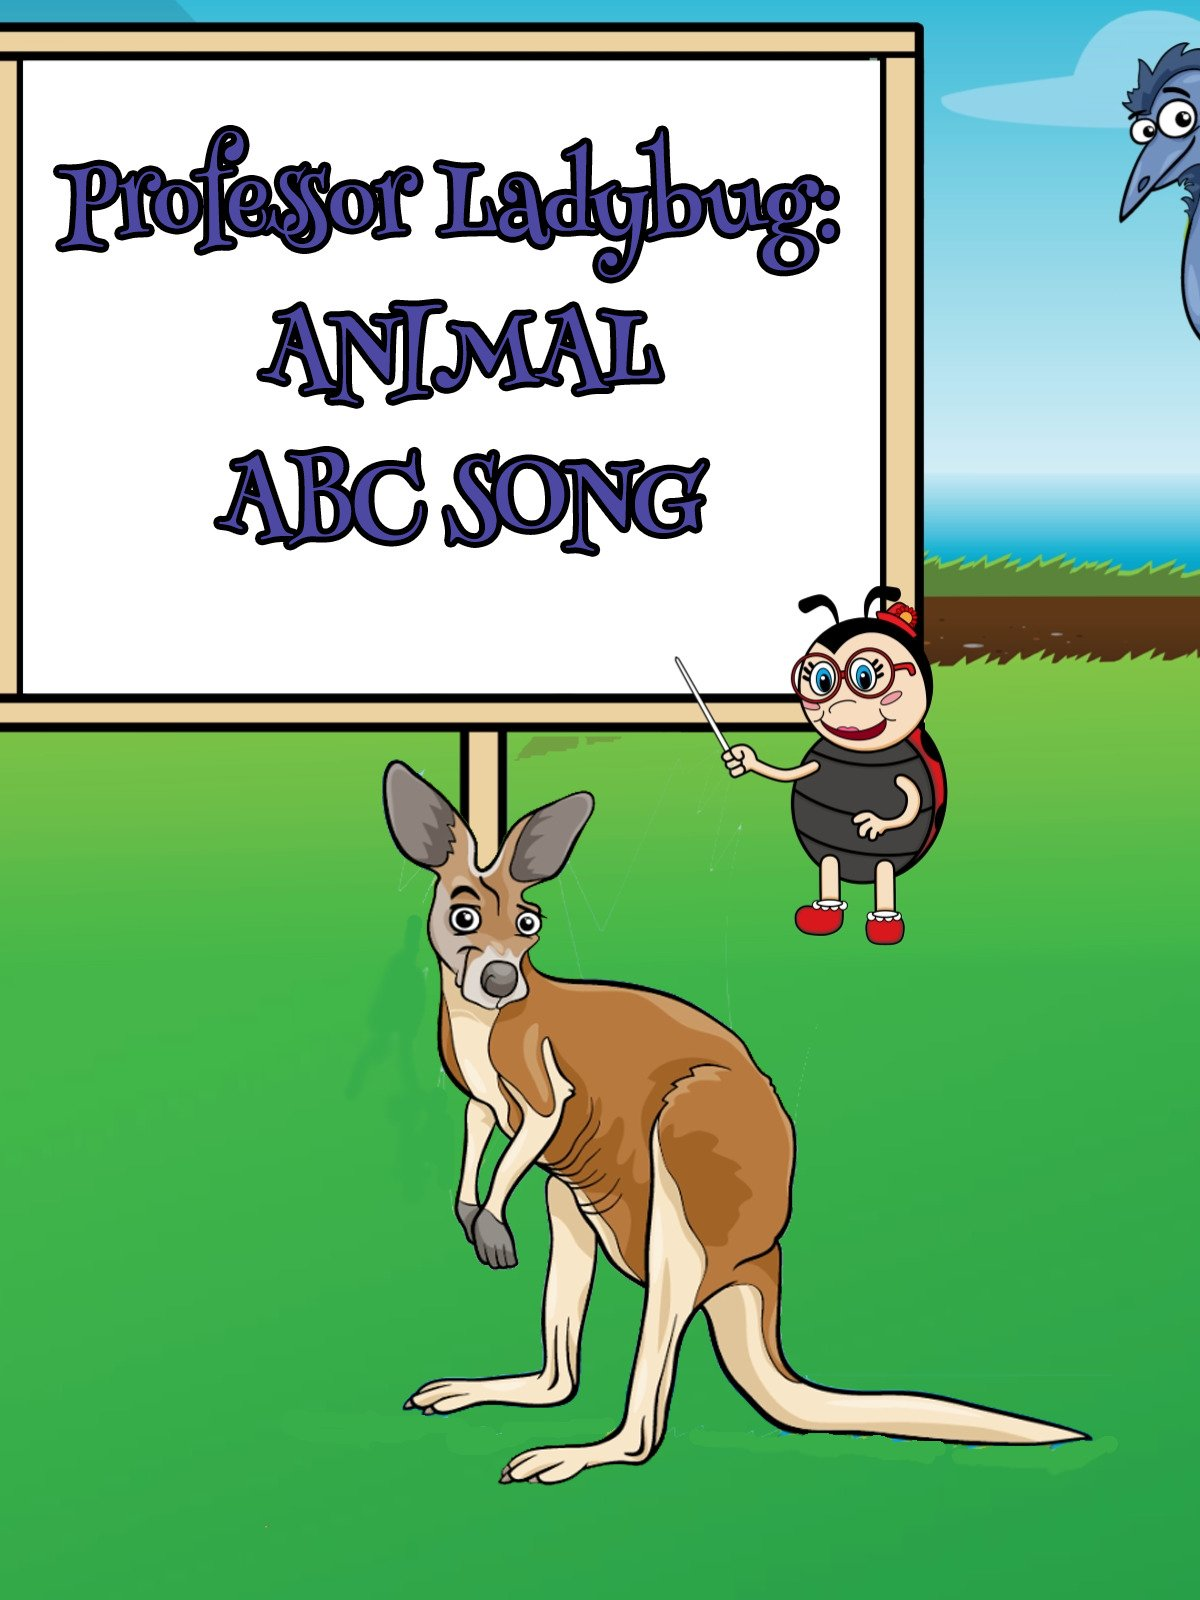 Professor Ladybug: Animal ABC Song